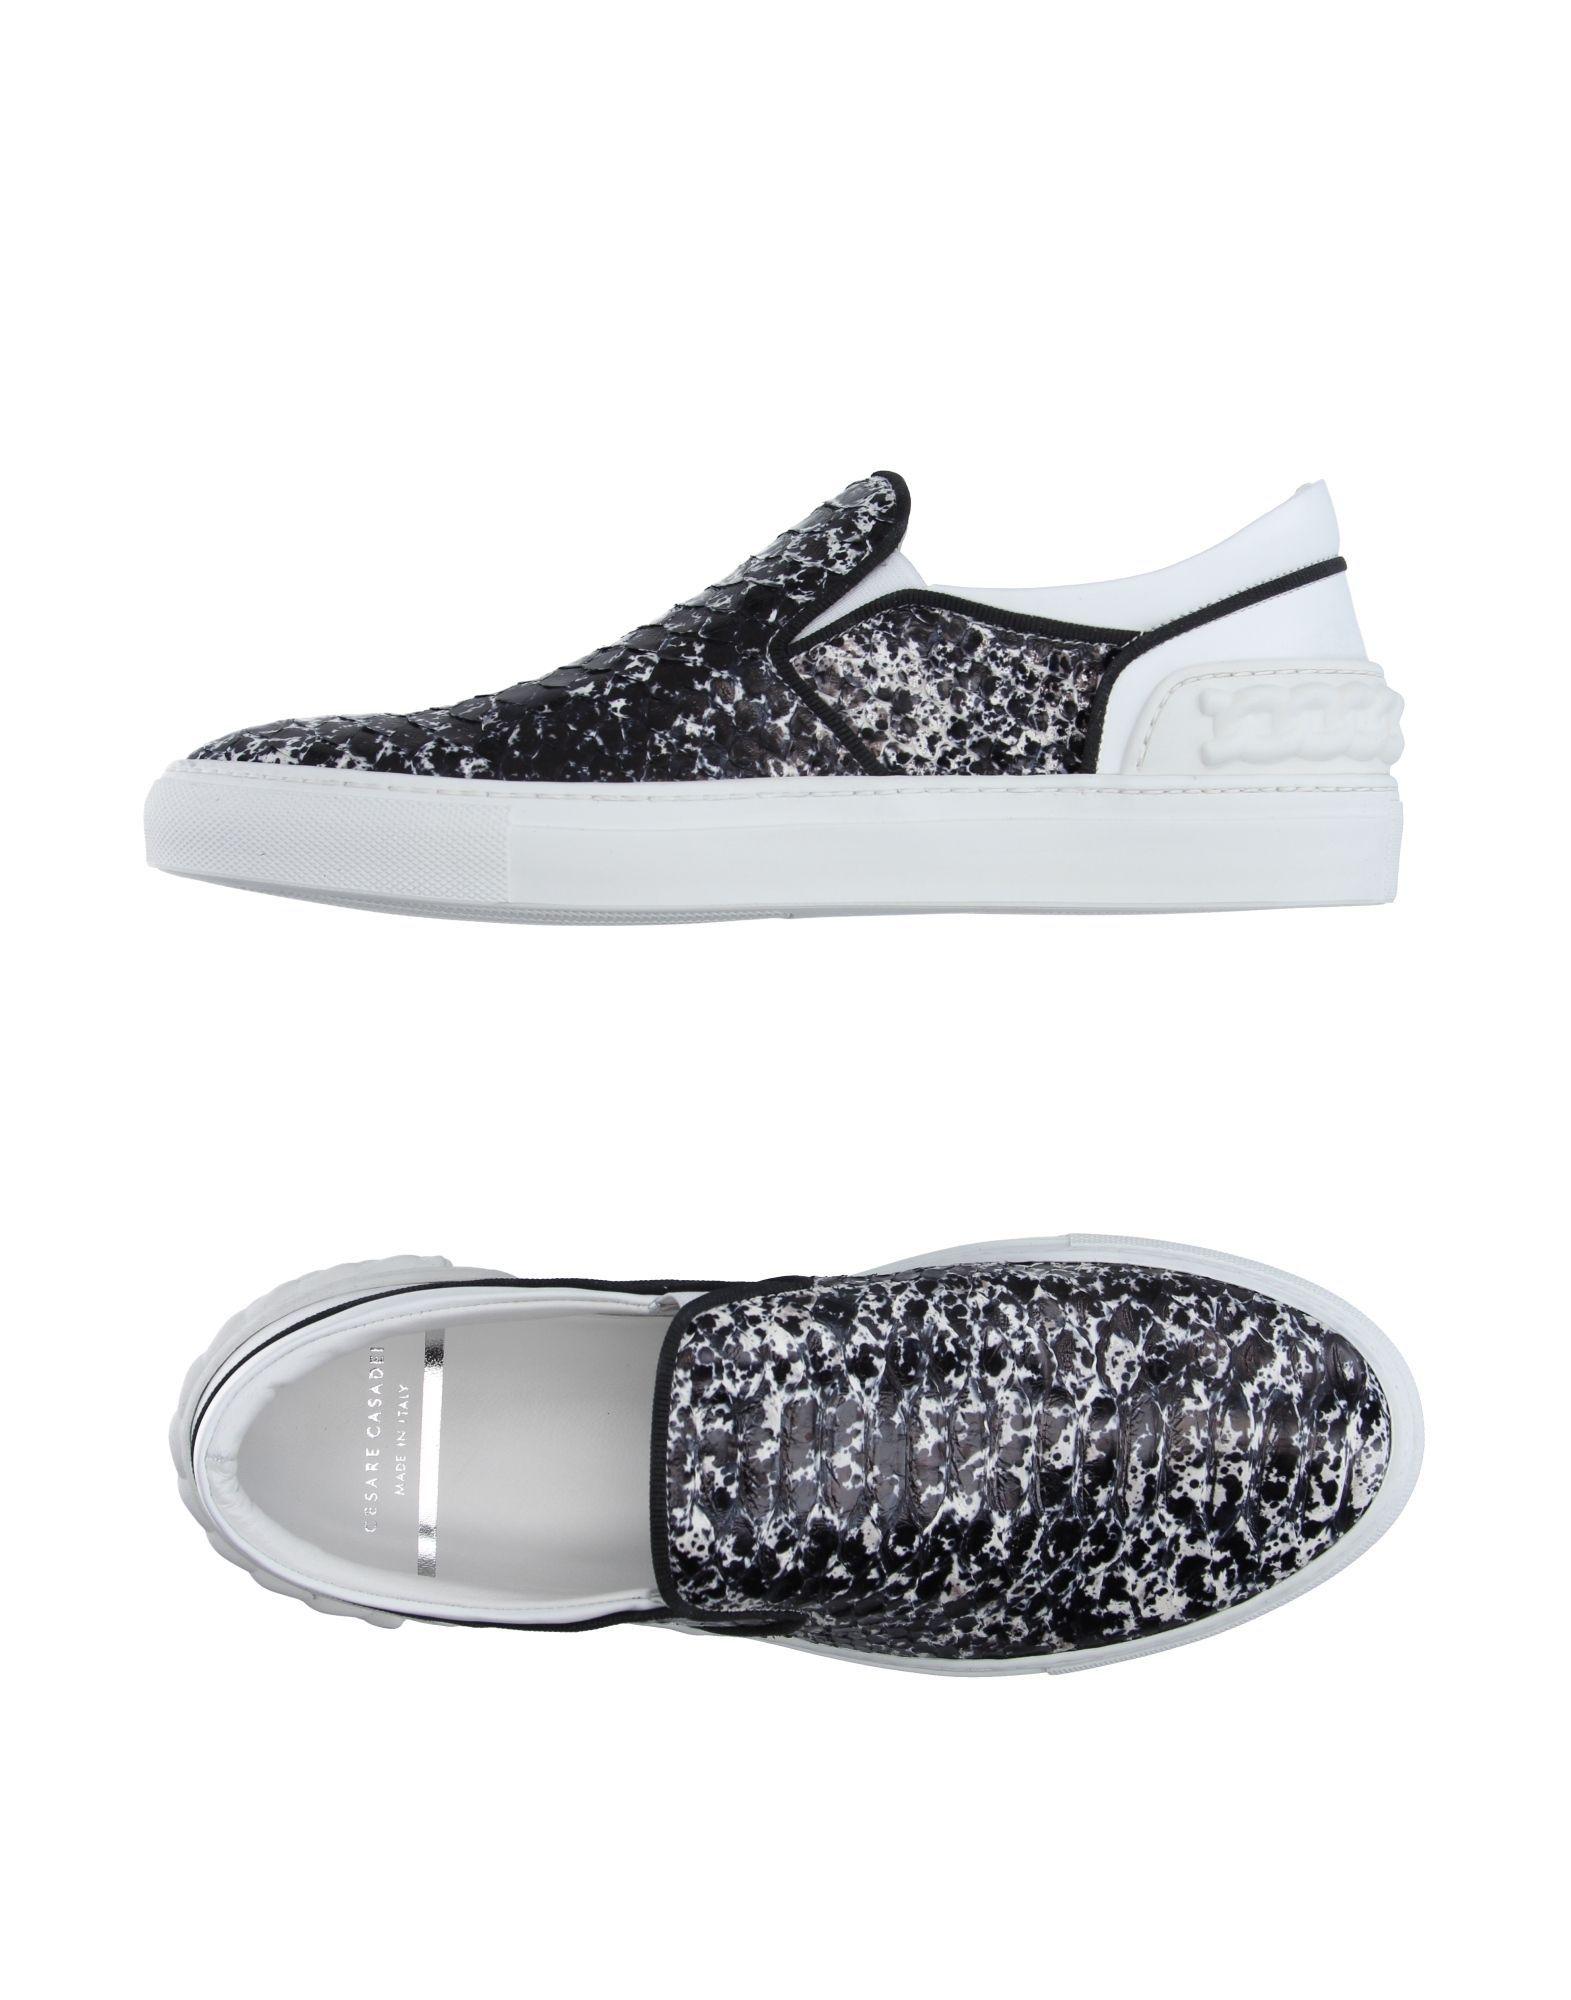 FOOTWEAR - Low-tops & sneakers Casadei crIsui